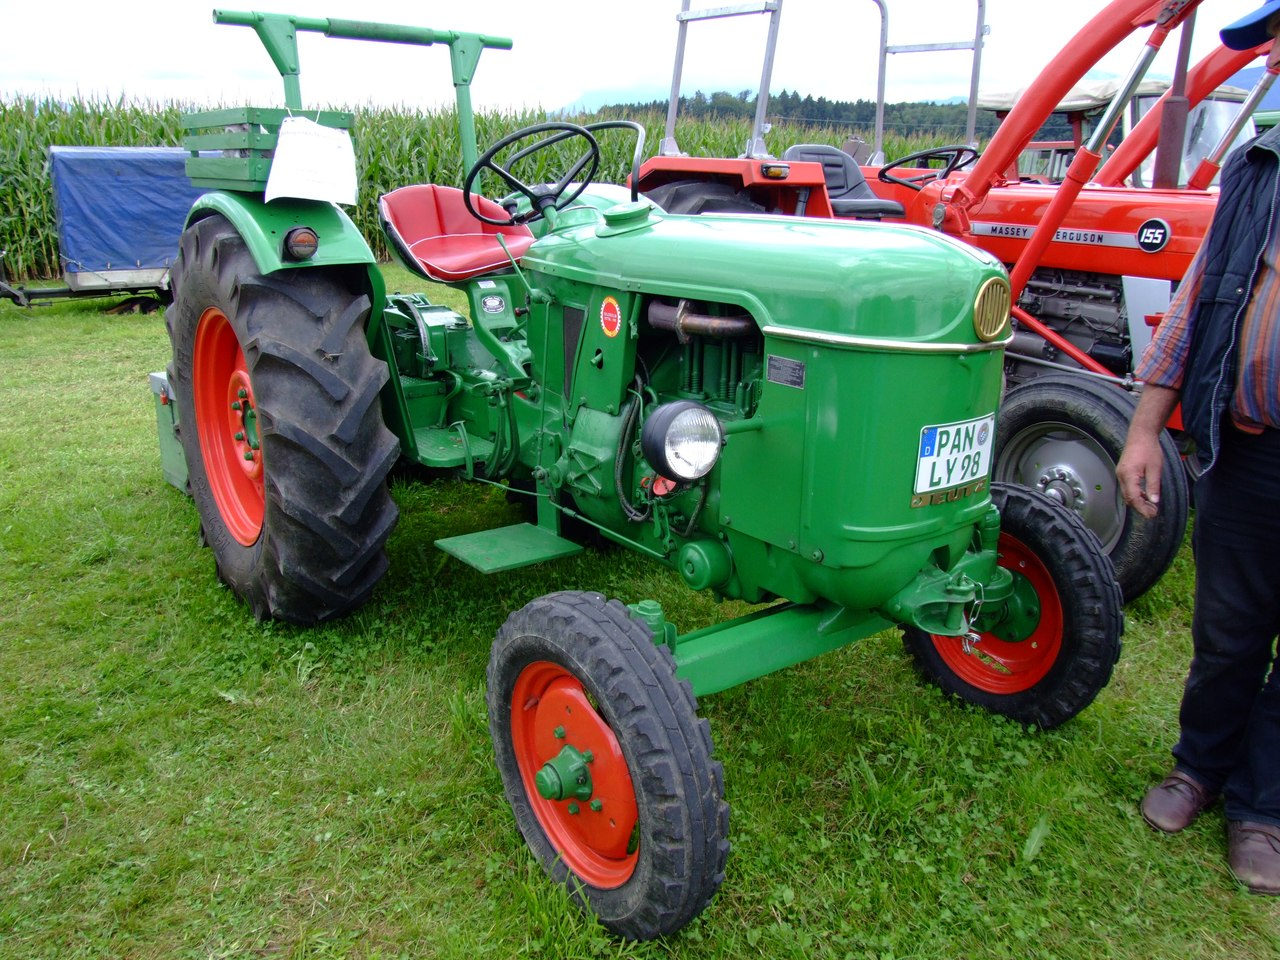 Motores de bosende tractores clsicos manuales de tractores ed2kfilemanual20de20usuario20tractor20deutz20diesel20schlepper2 0d30d30sd25en20alemanpdf2471183031bb97ac81050fd32a6acc427350c70dh fandeluxe Gallery